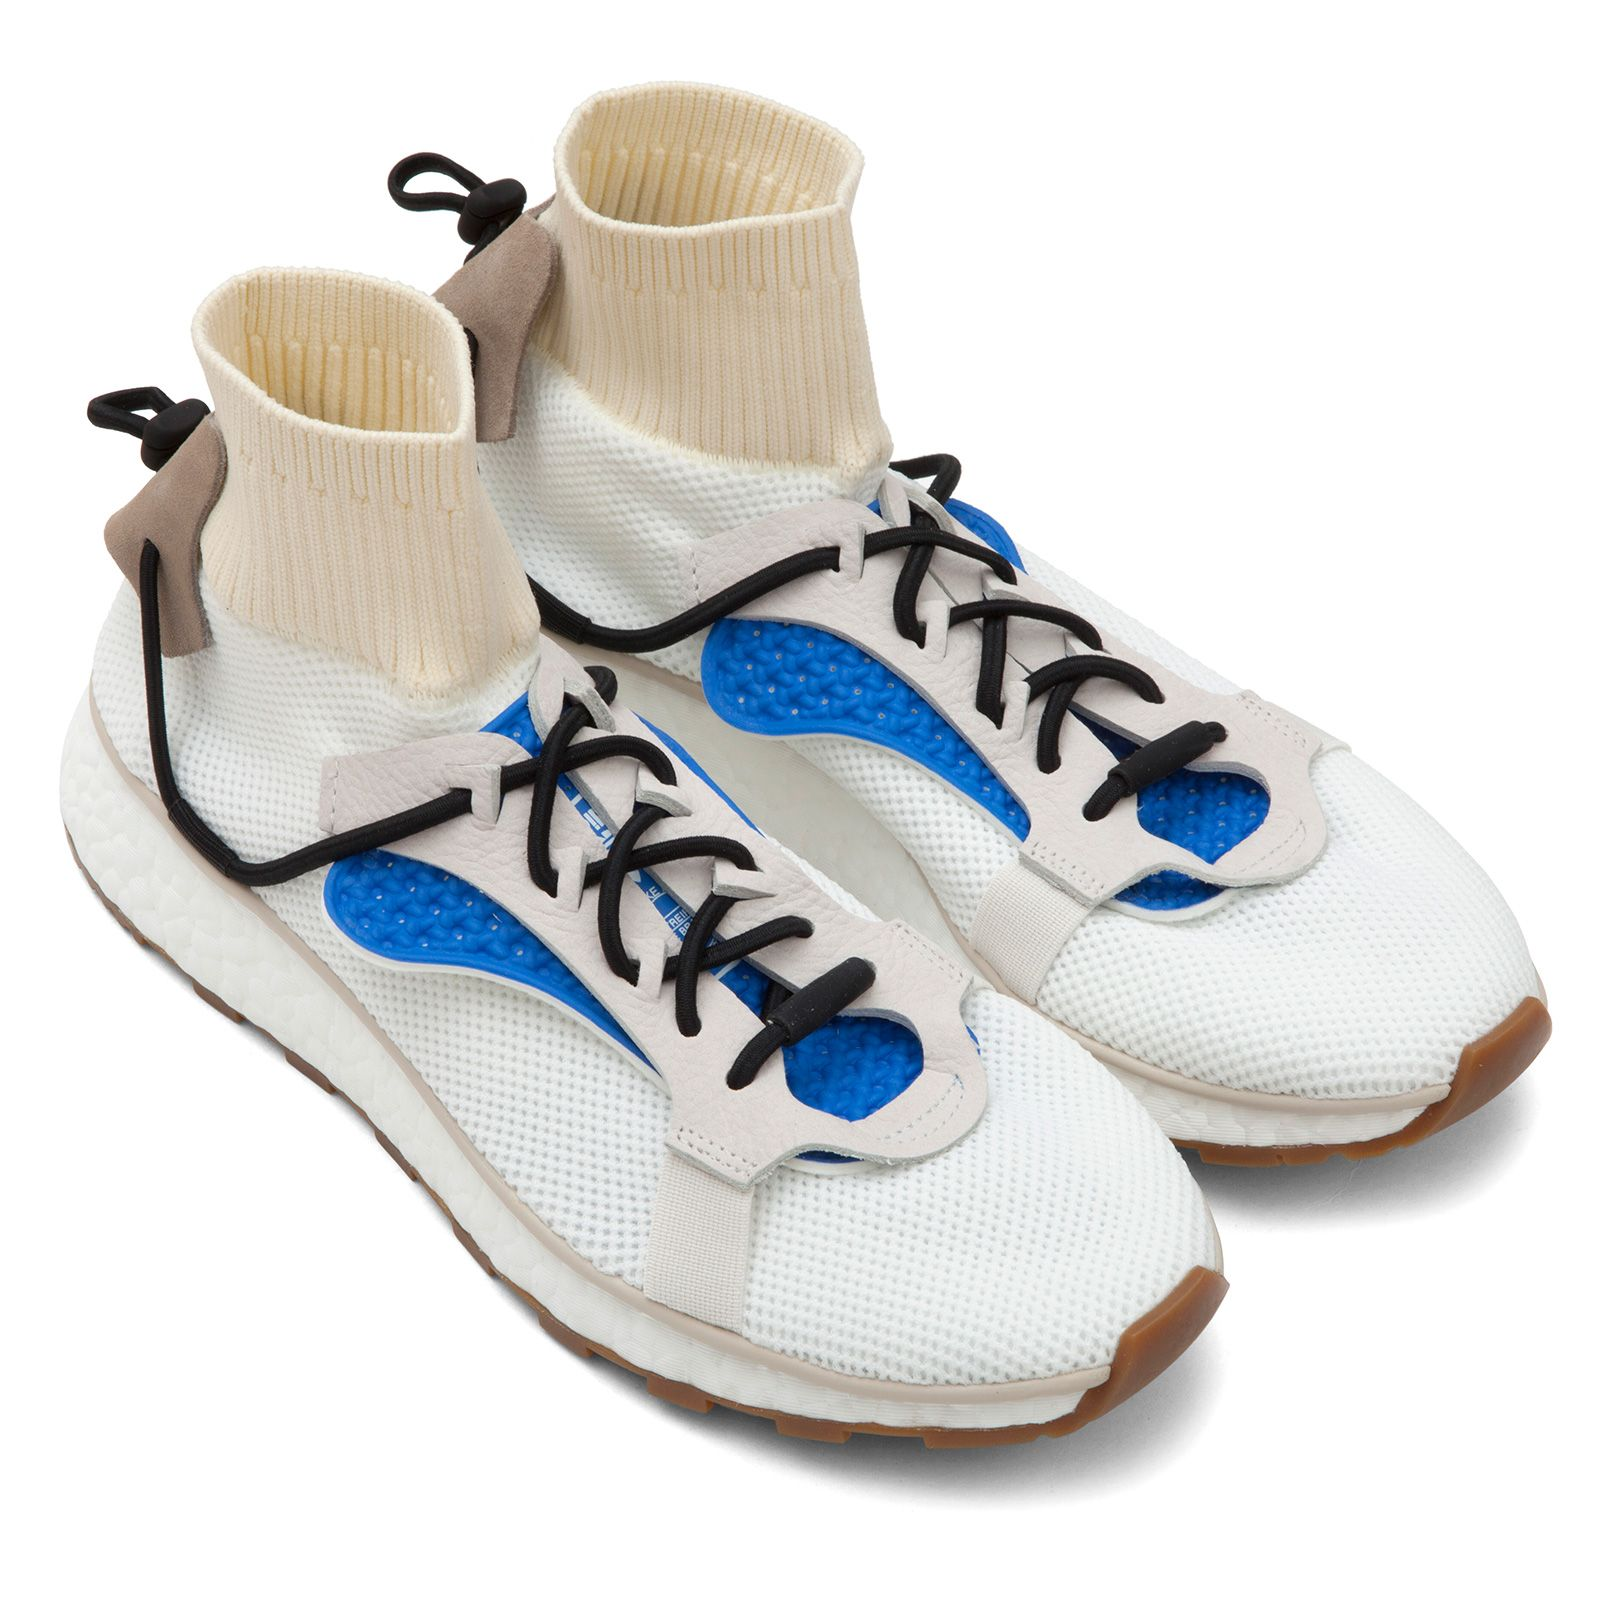 adidas Originals by Alexander Wang / AW Run adidas by Alexander Wang / Shoes  | Storm